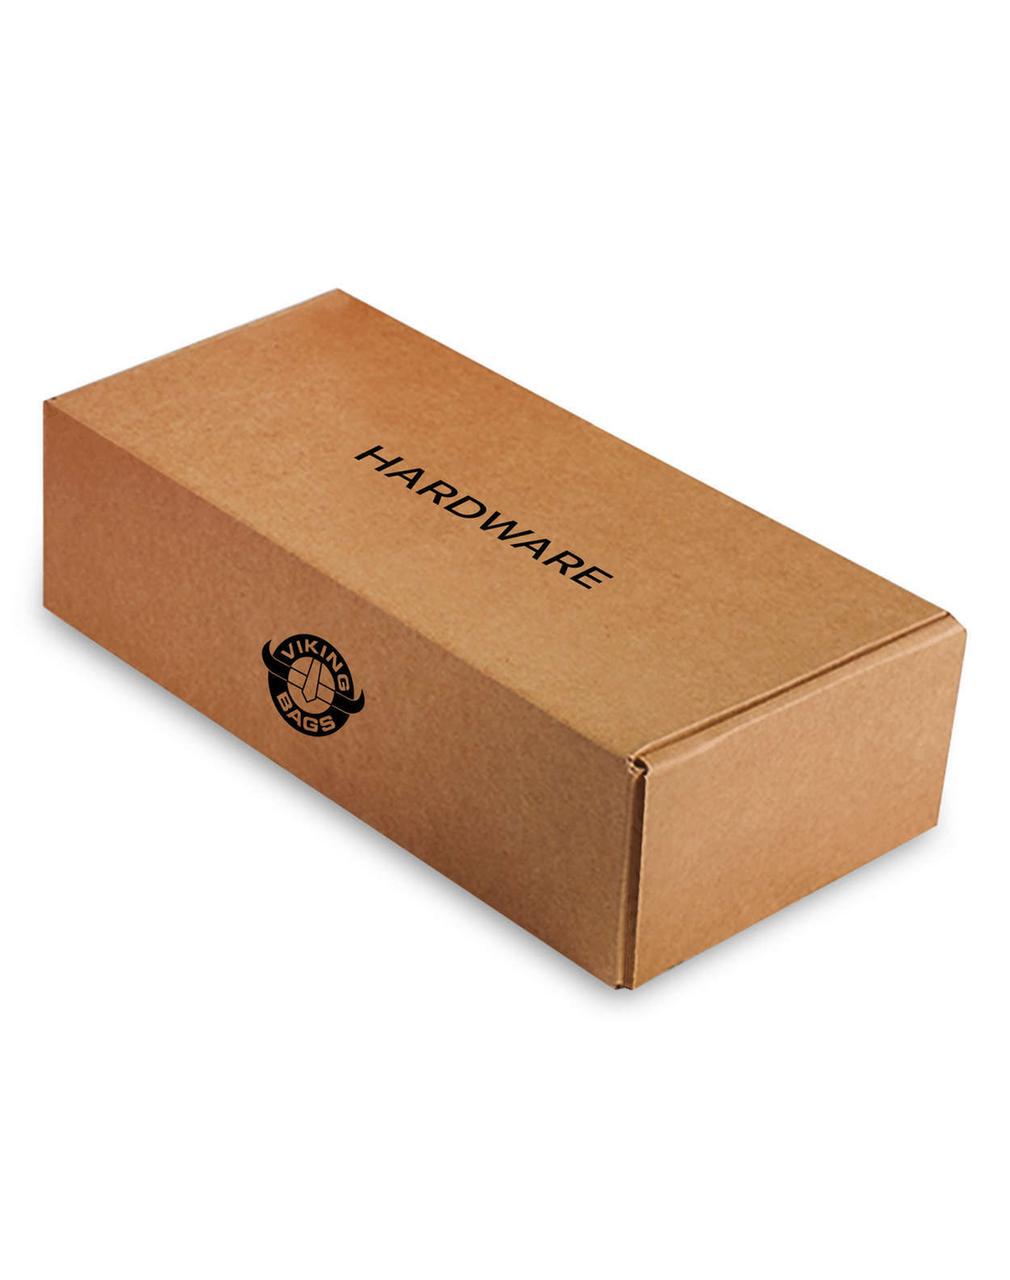 Honda 1500 Valkyrie Standard Viking Lamellar Leather Covered Shock Cutout Hard Saddlebag Box